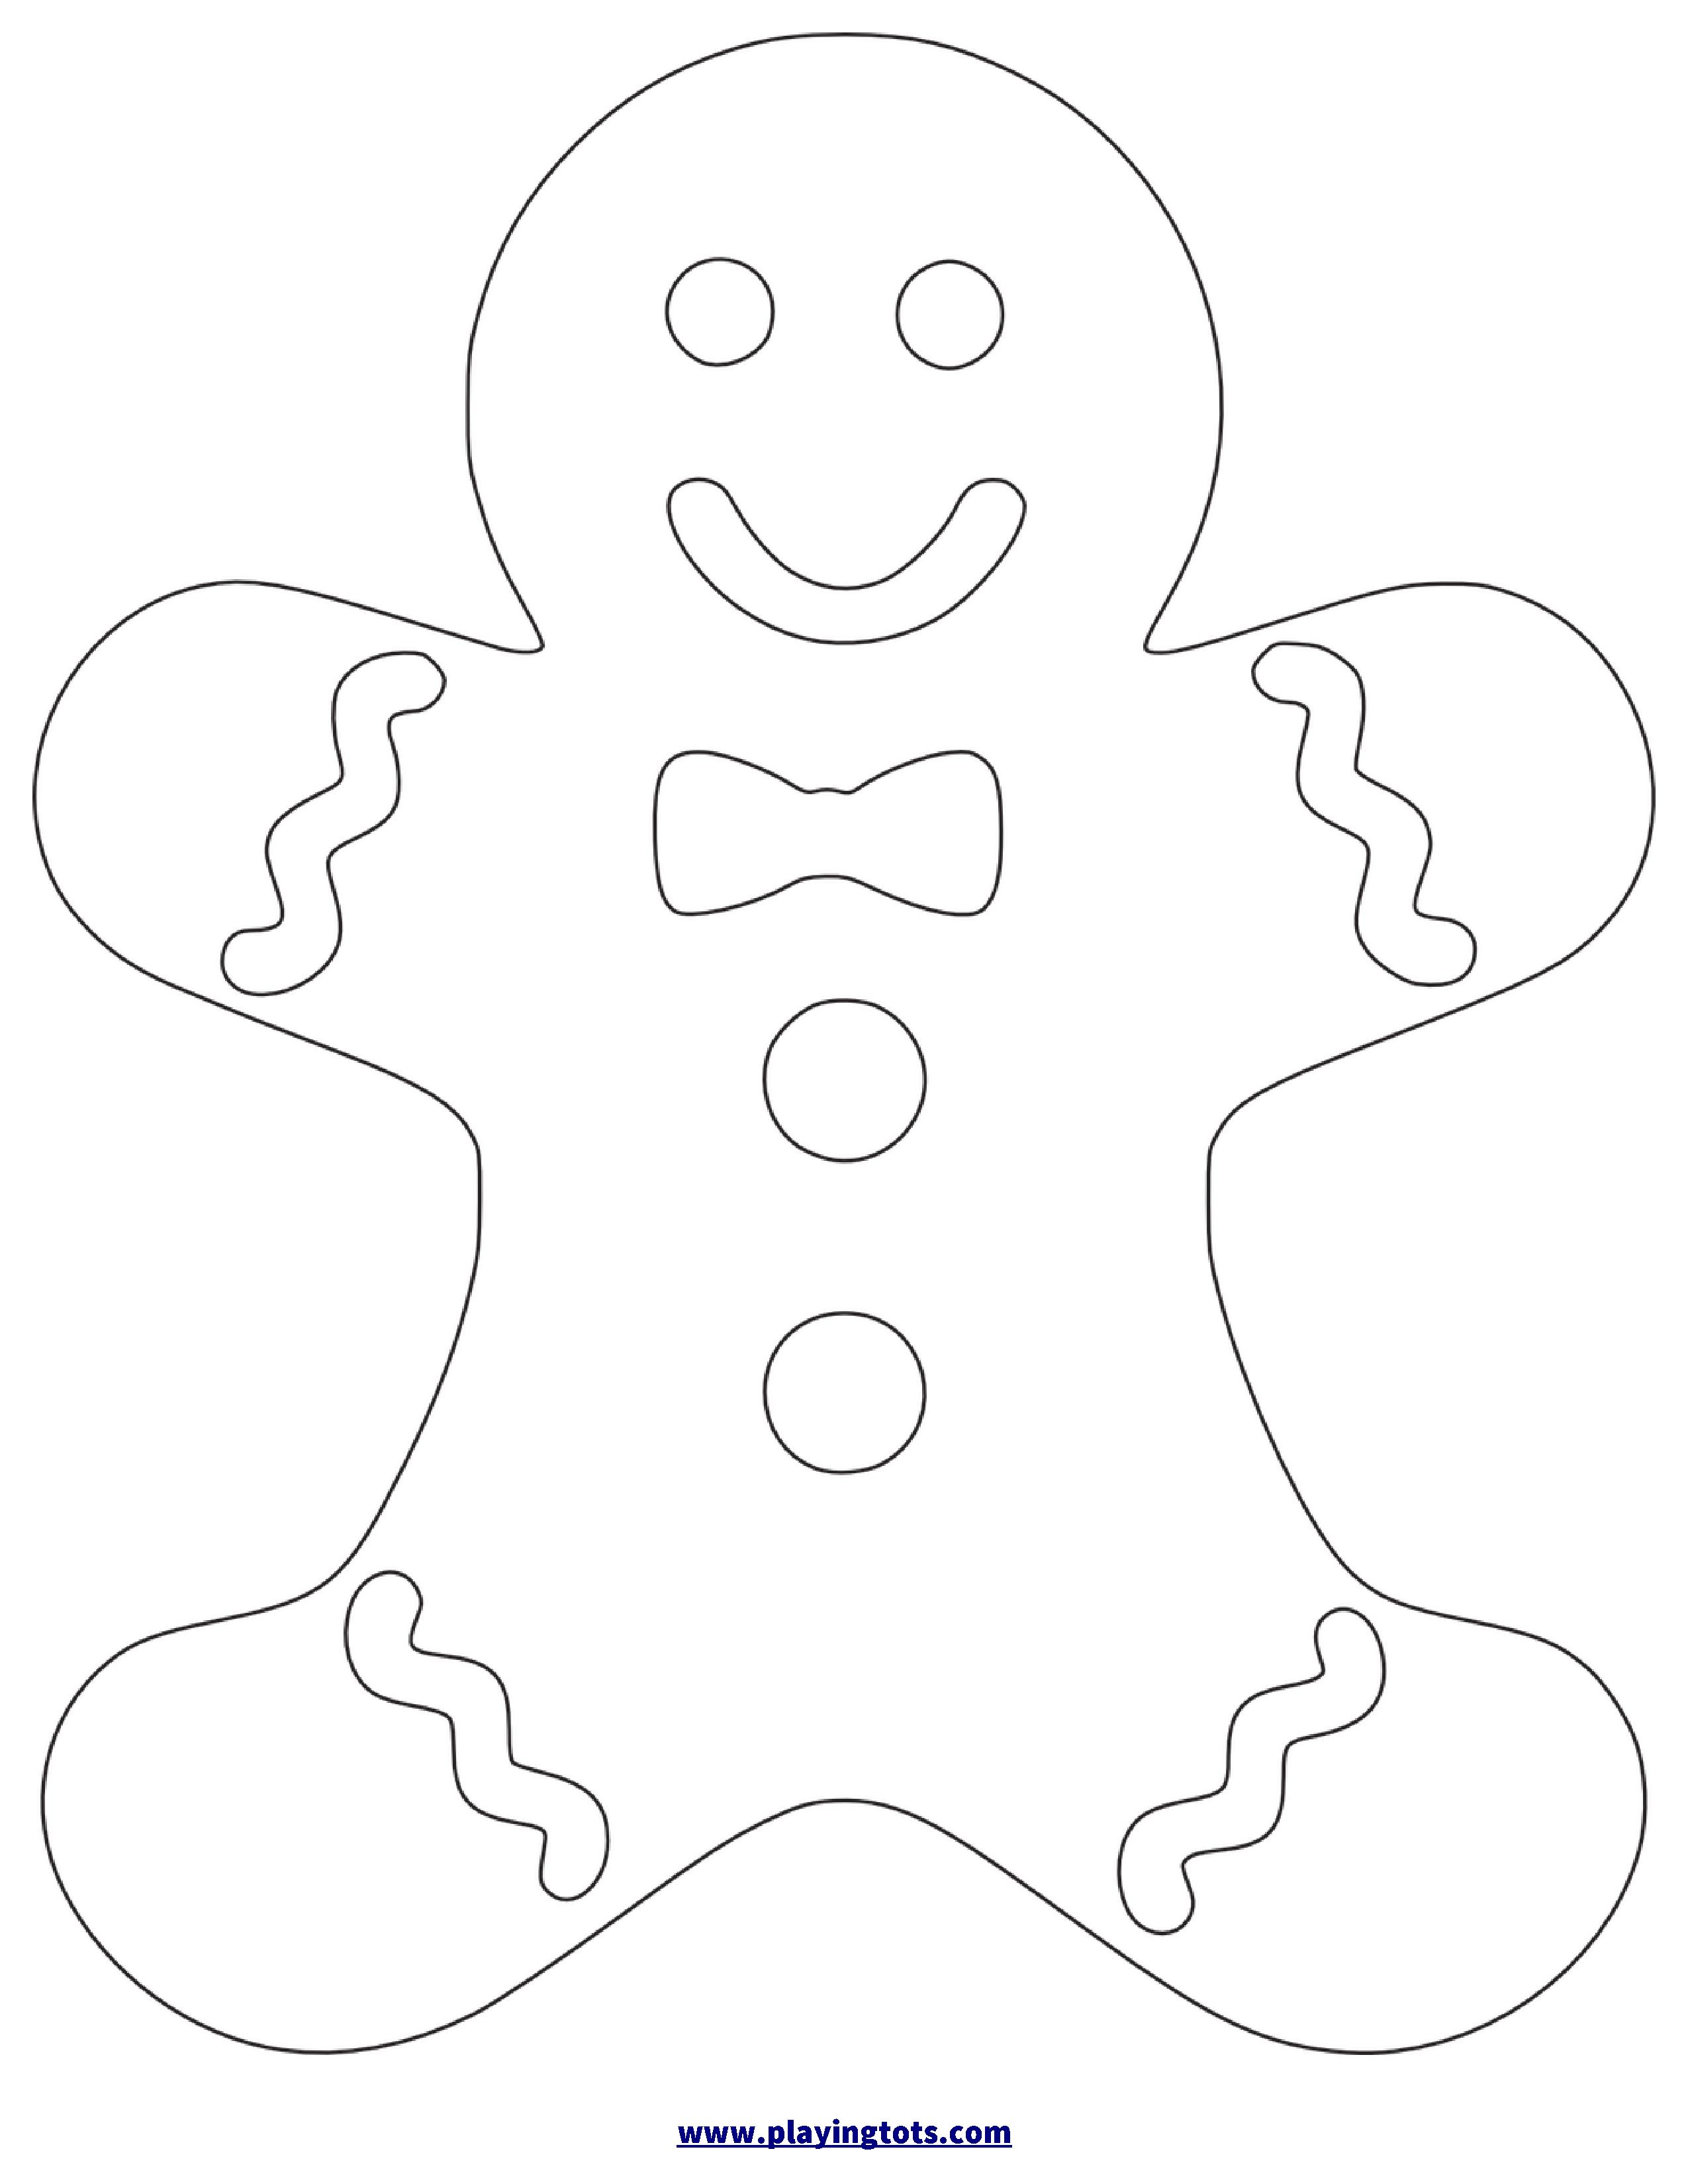 Free Printable Gingerbread Man Worksheet   Coloring Pages